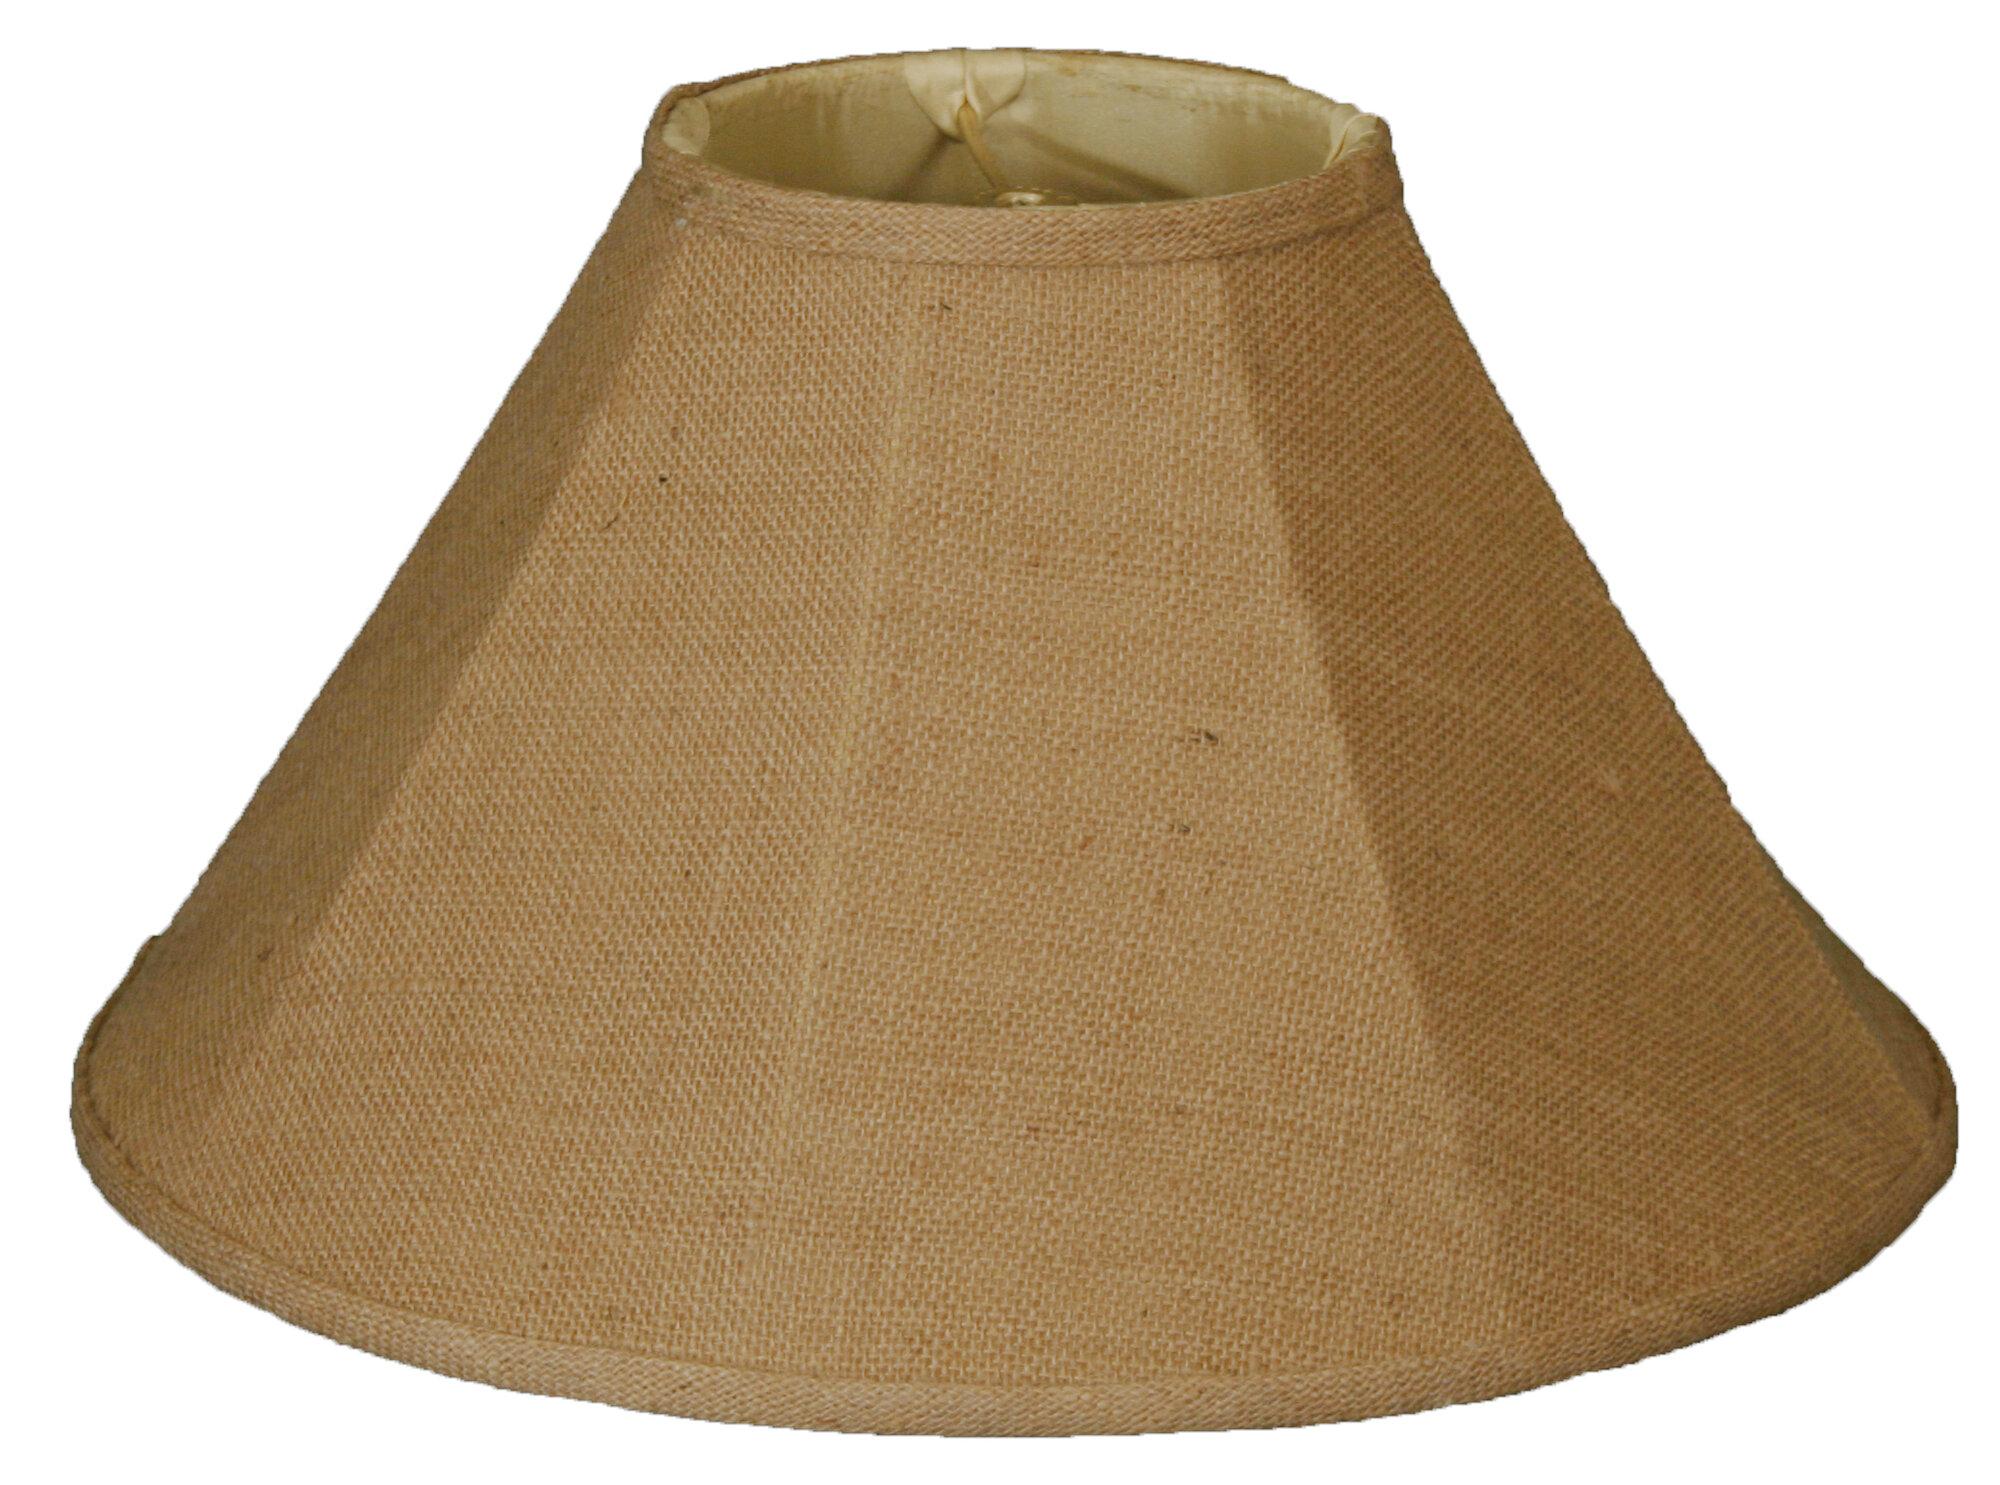 Burlap Lamp Shades : Royal designs timeless quot burlap empire lamp shade rdes